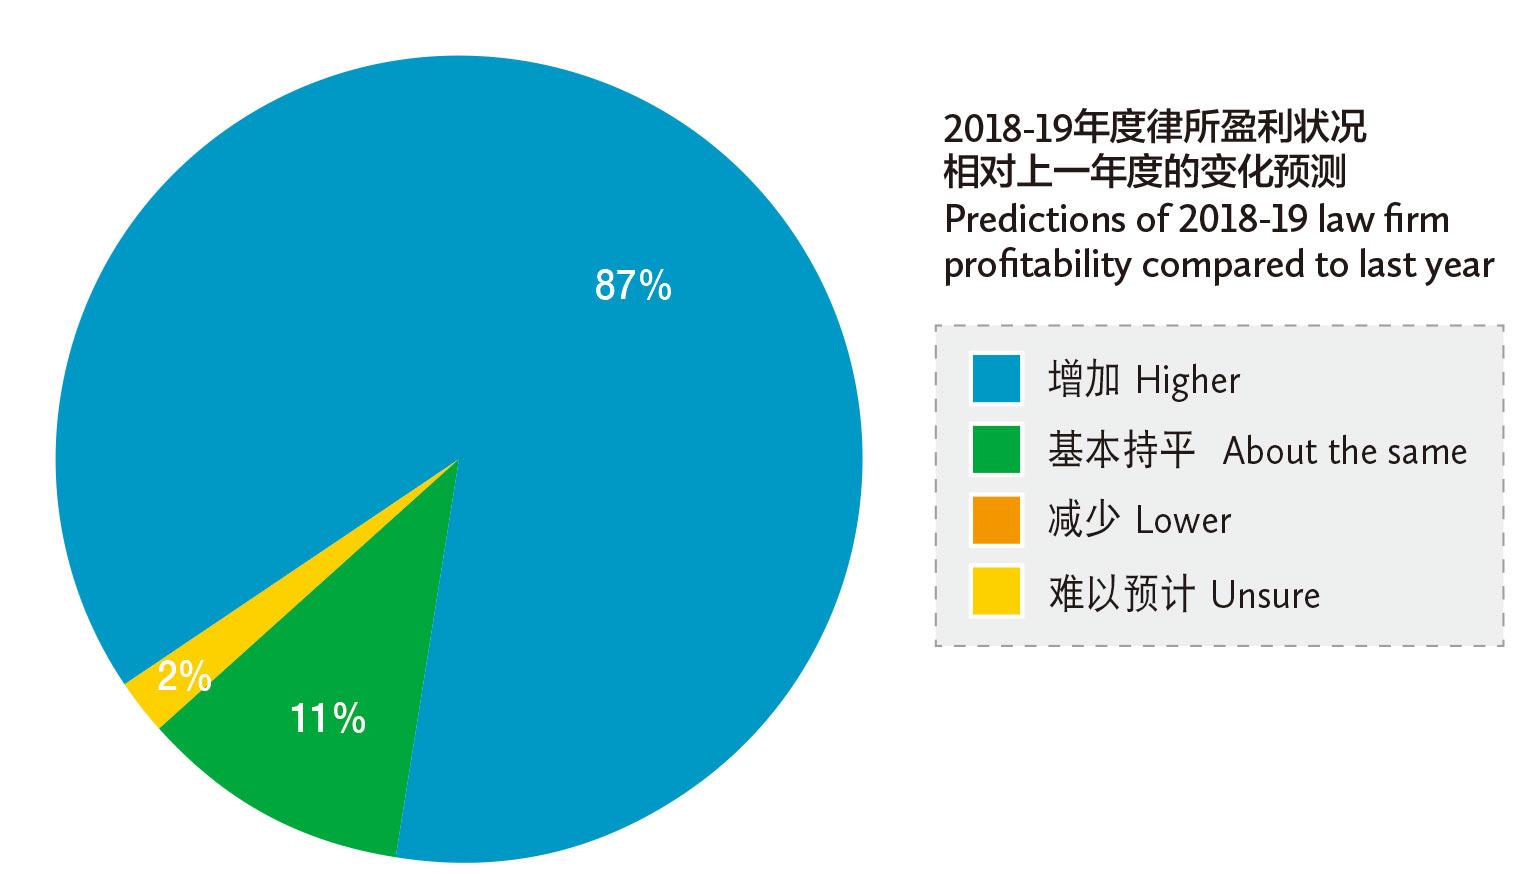 2018-19年度律所盈利状况-相对上一年度的变化预测-Predictions-of-2018-19-law-firm-profitability-compared-to-last-year